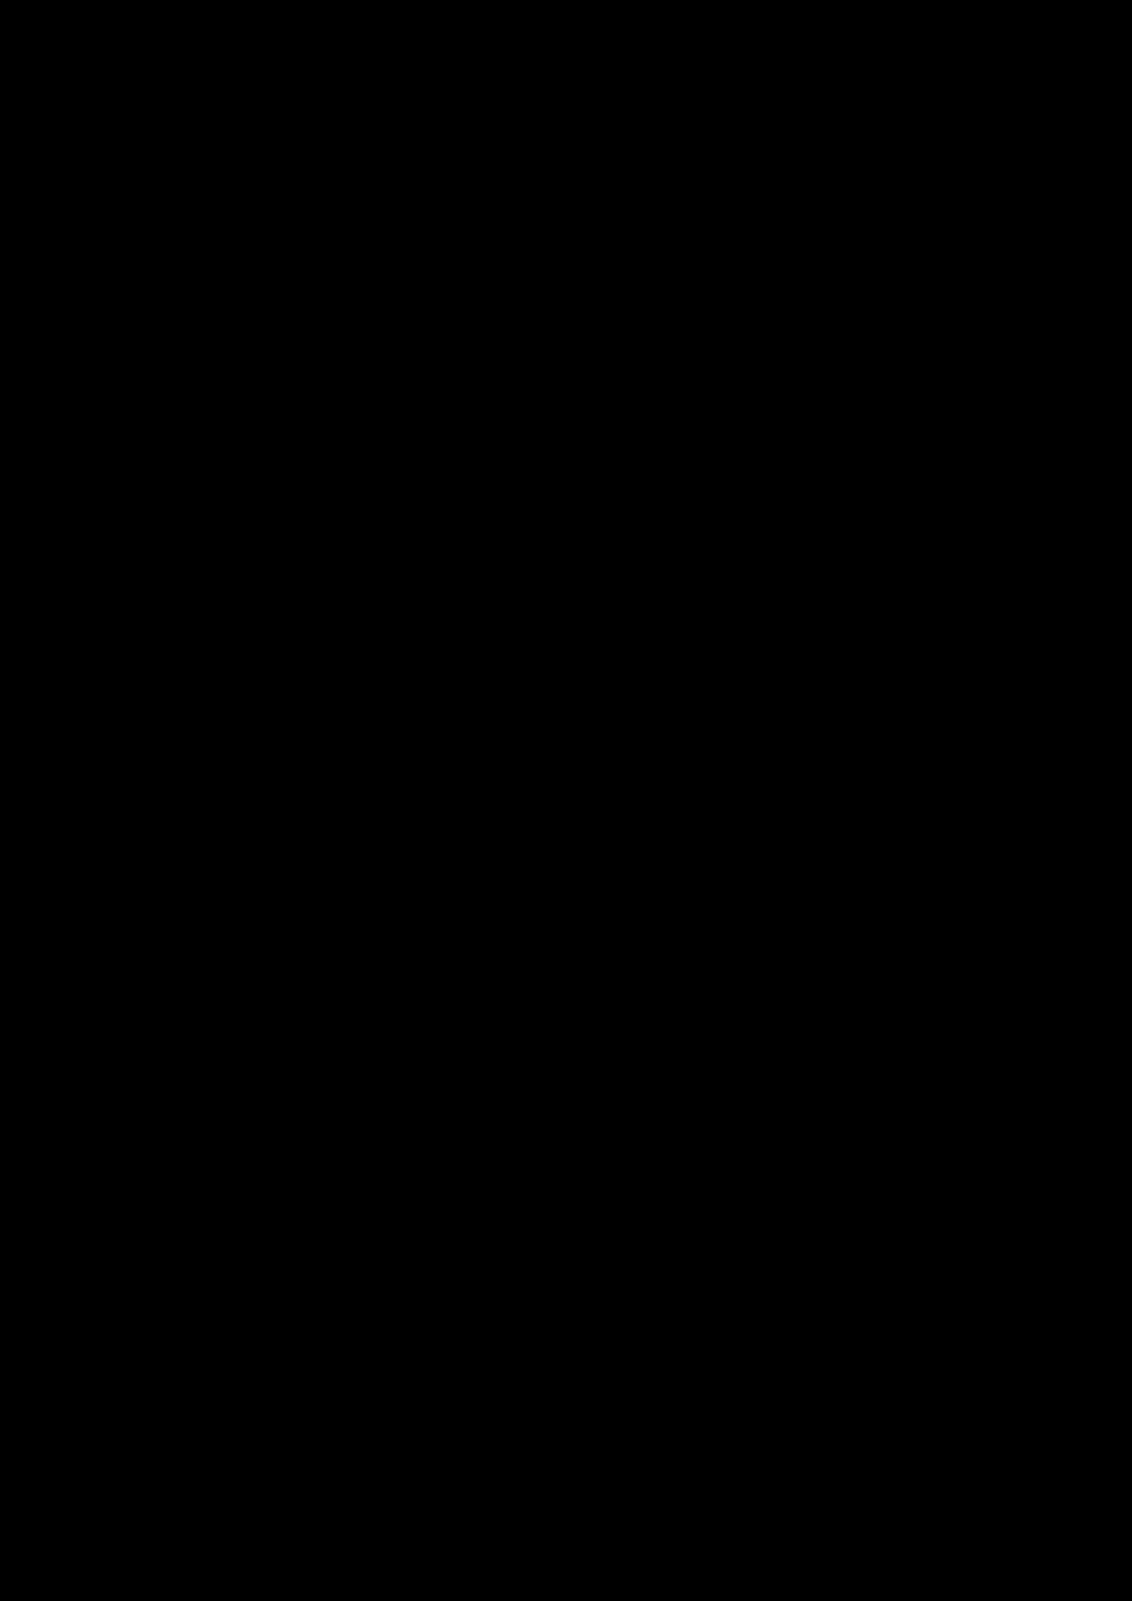 Belyiy sokol slide, Image 132